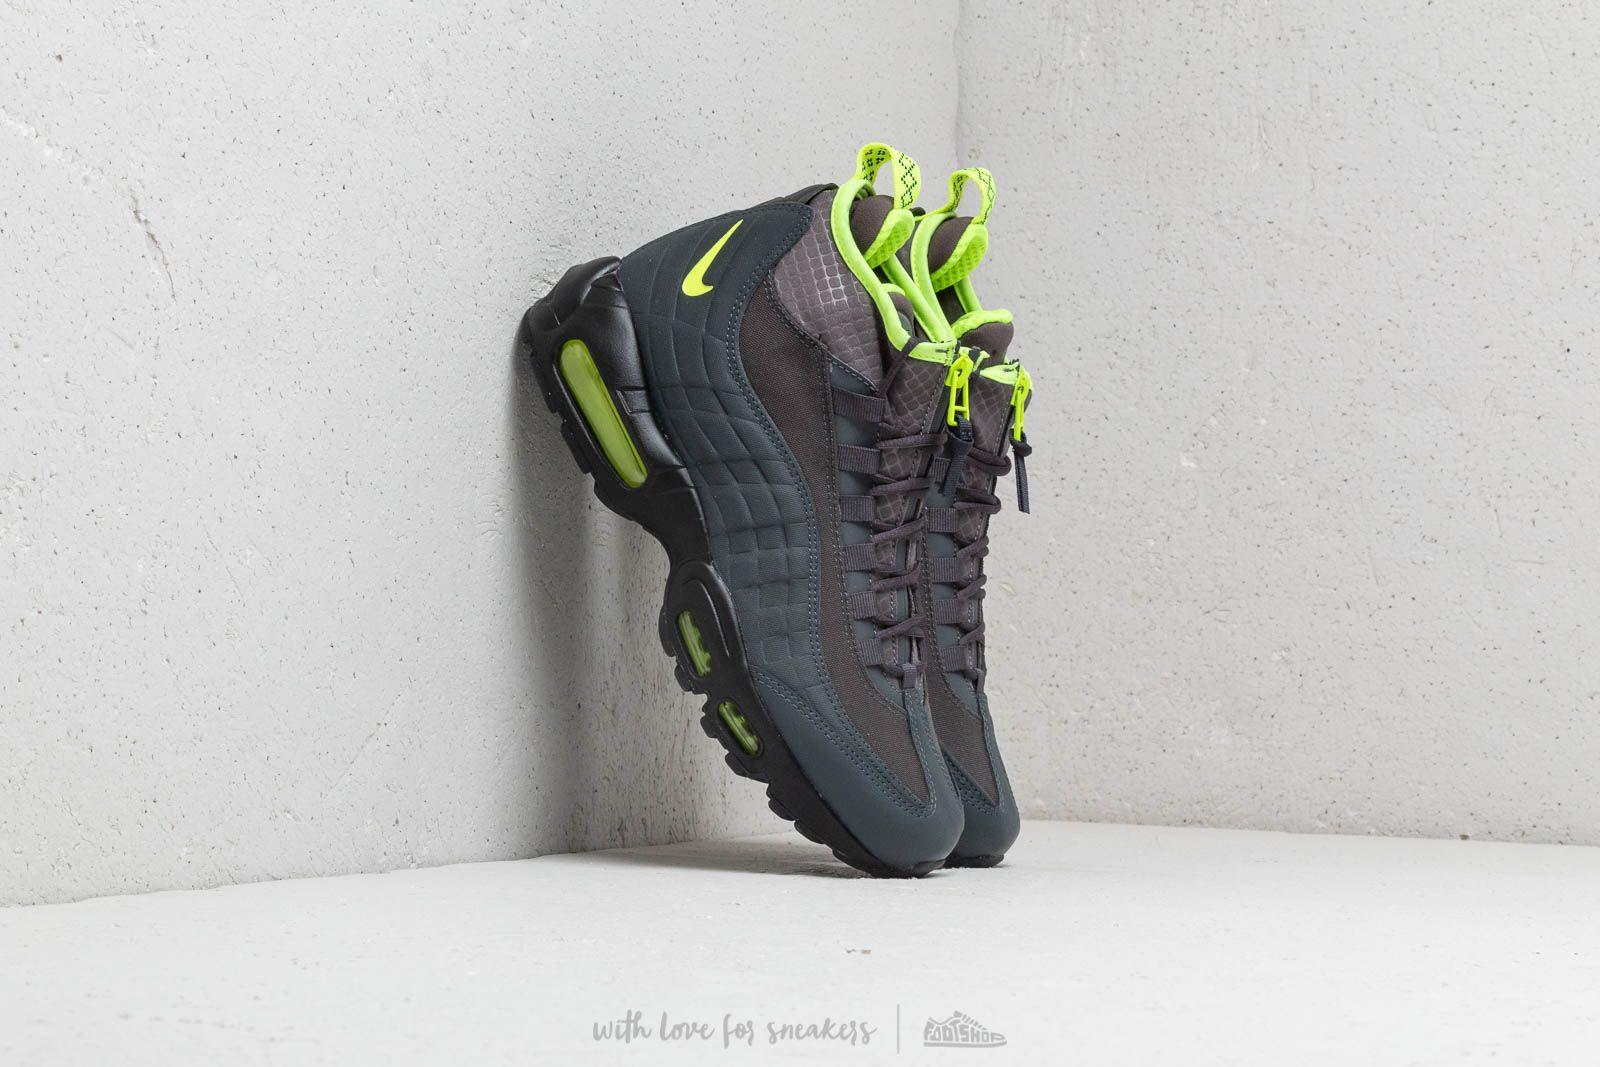 bb57ad721e01 Nike Air Max 95 Sneakerboot Anthracite  Volt-Dark Frey